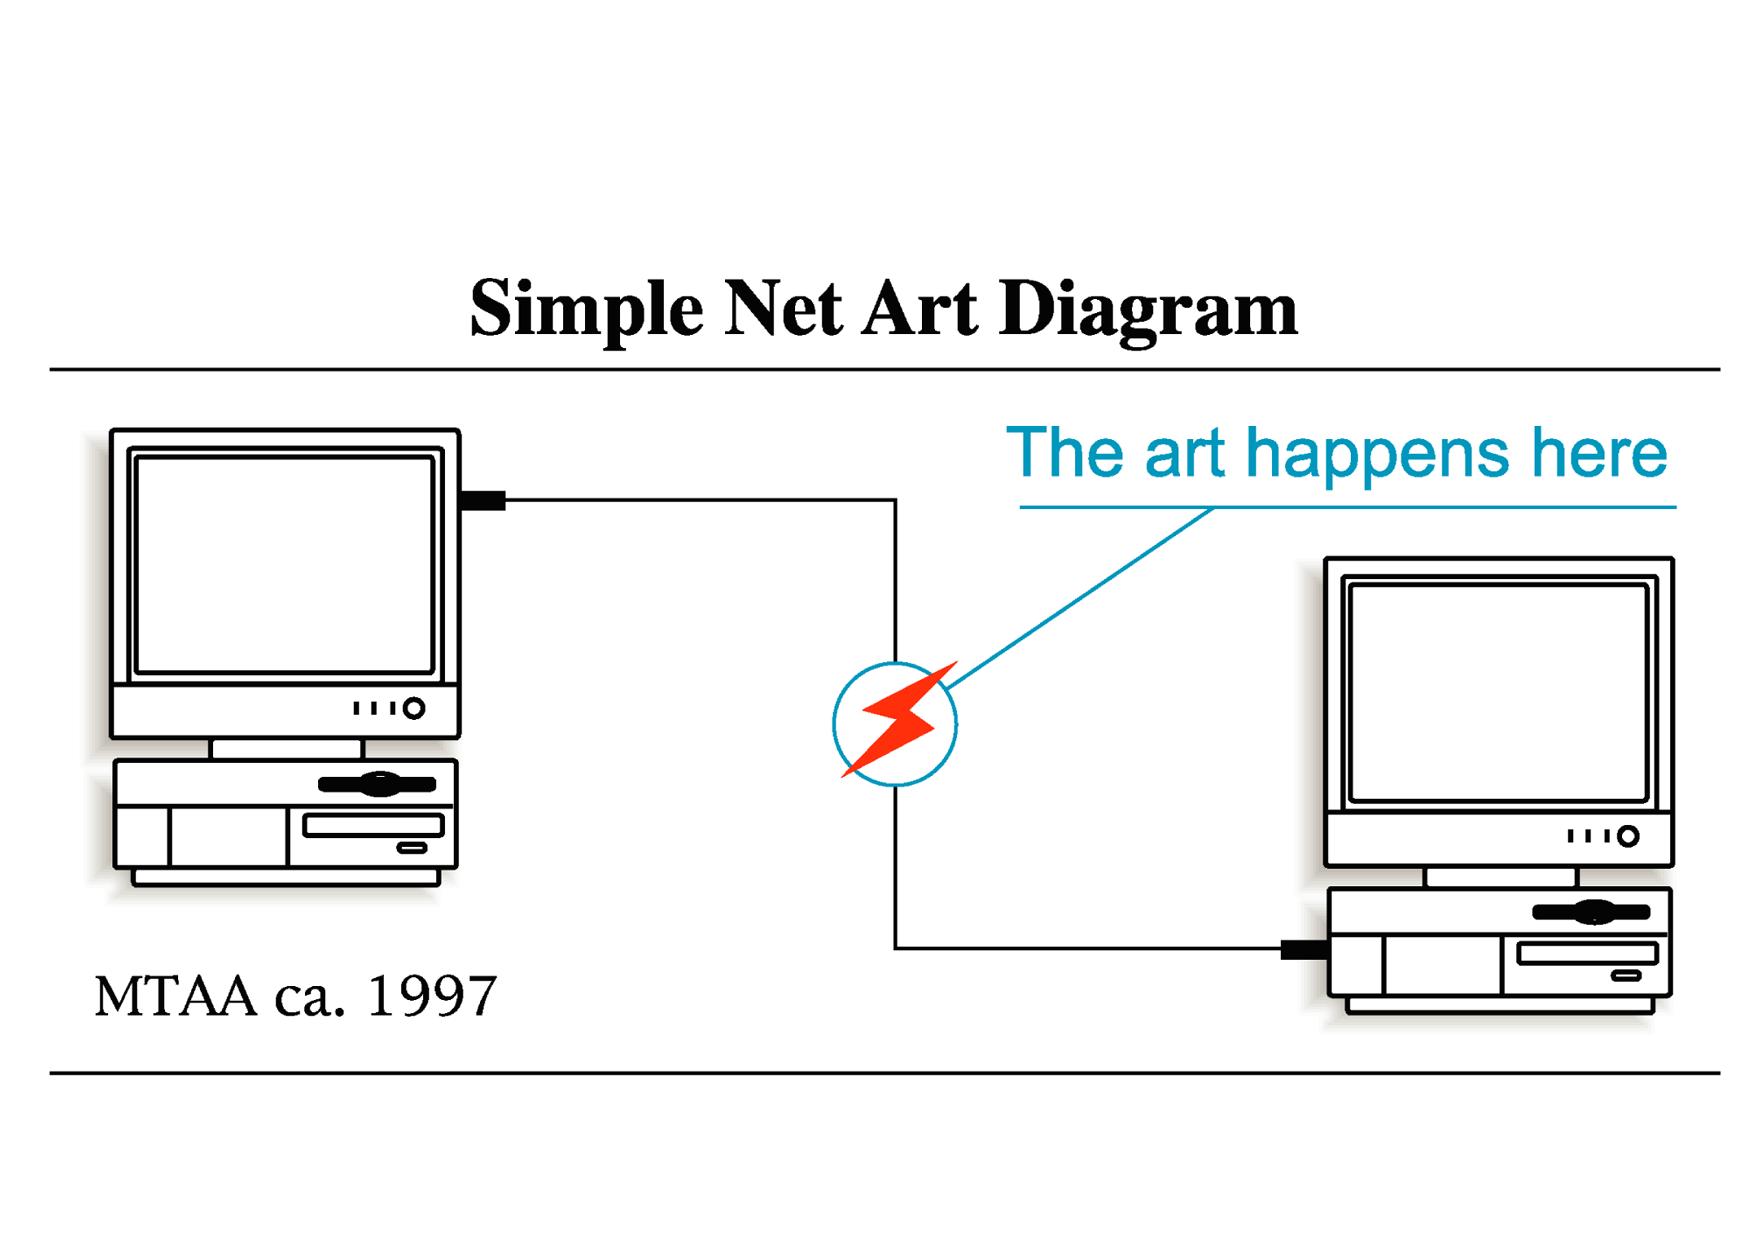 MTAA Simple Net Art Diagram (Screenshot)